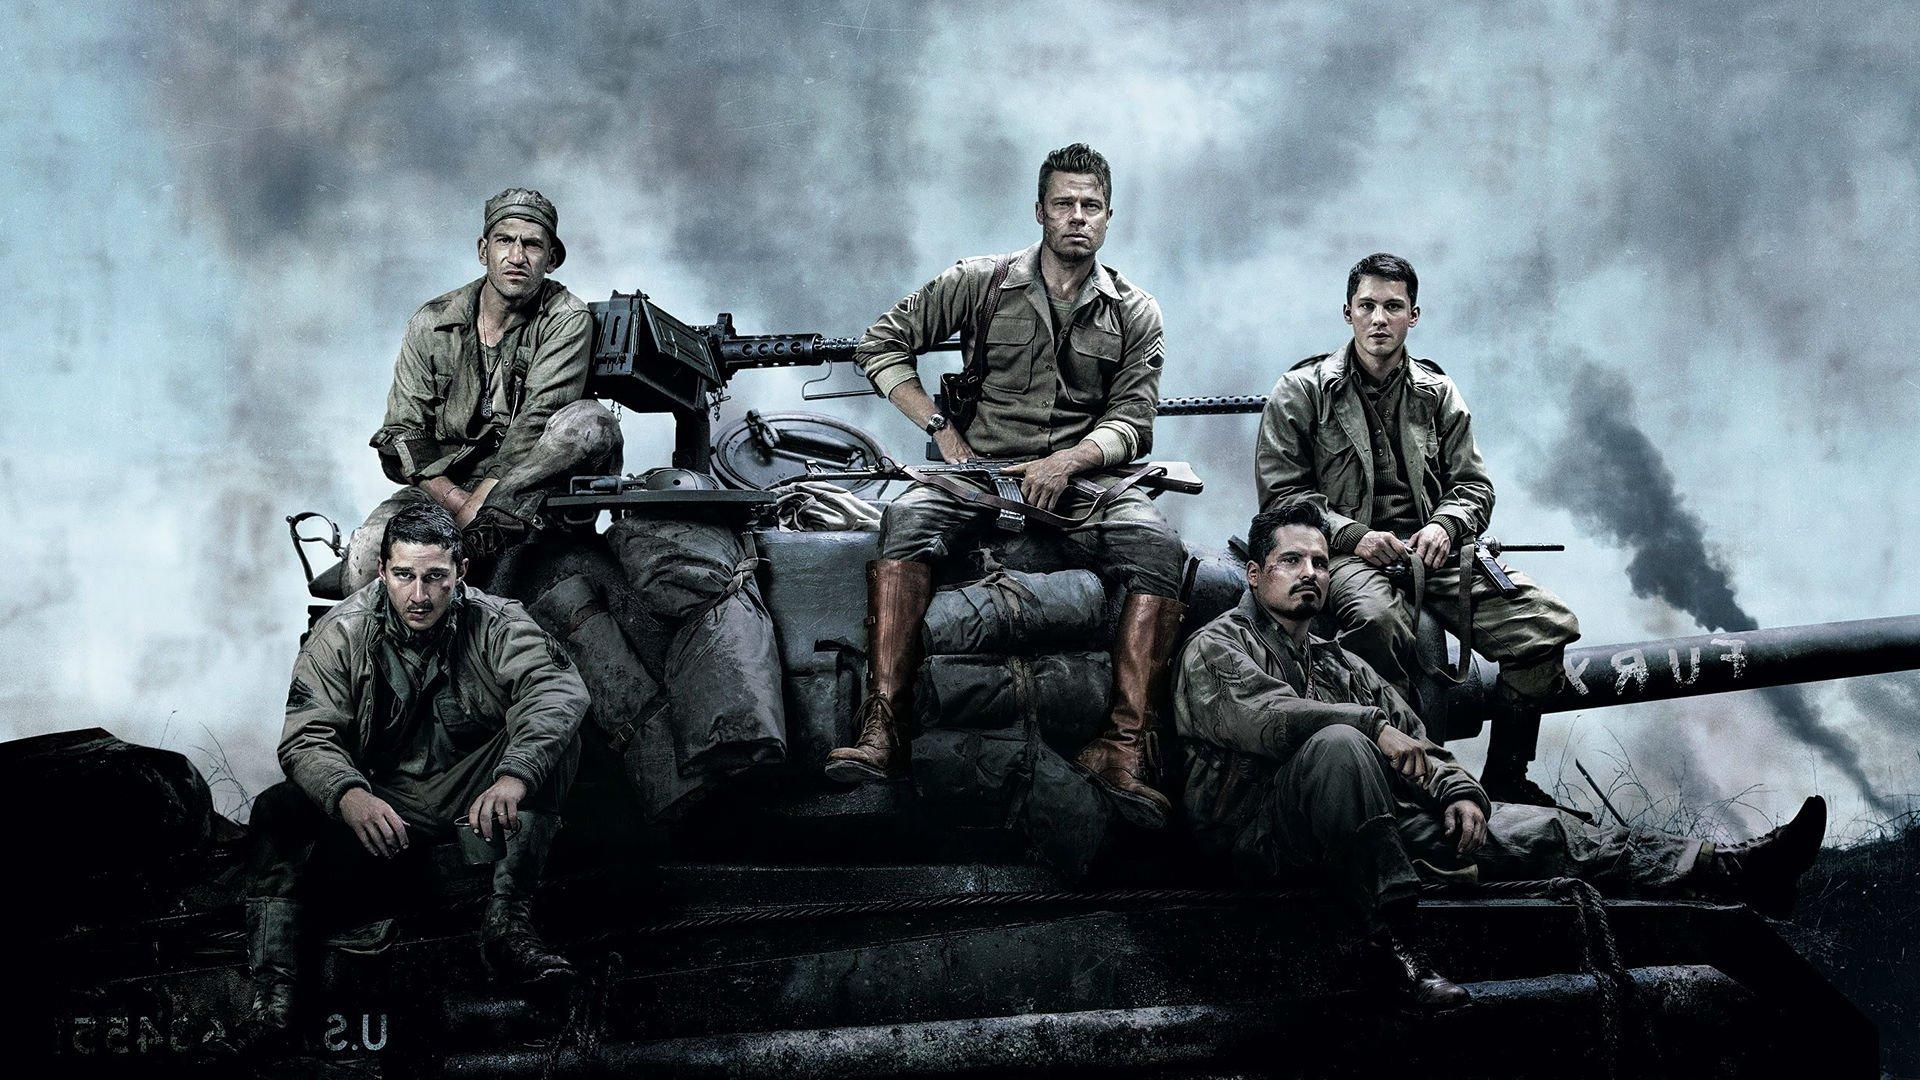 FURY action drama war brad pitt military tank war 1fury fighting ...